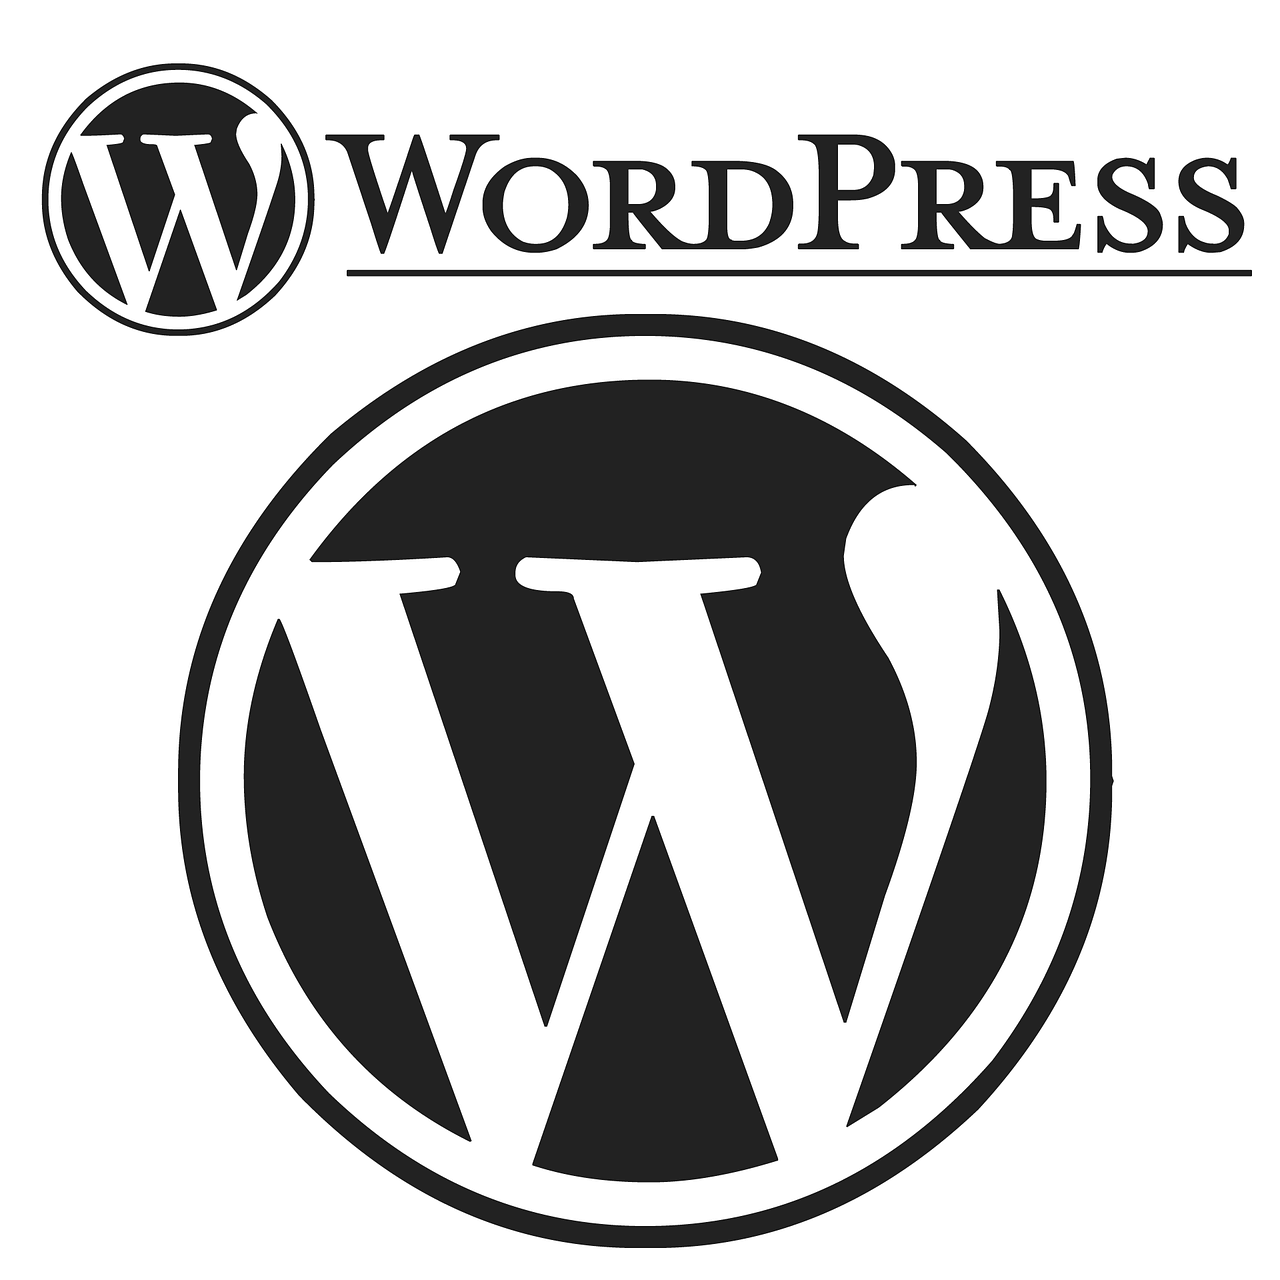 Wordpress Blogging Blog Website  - magicaltar0 / Pixabay